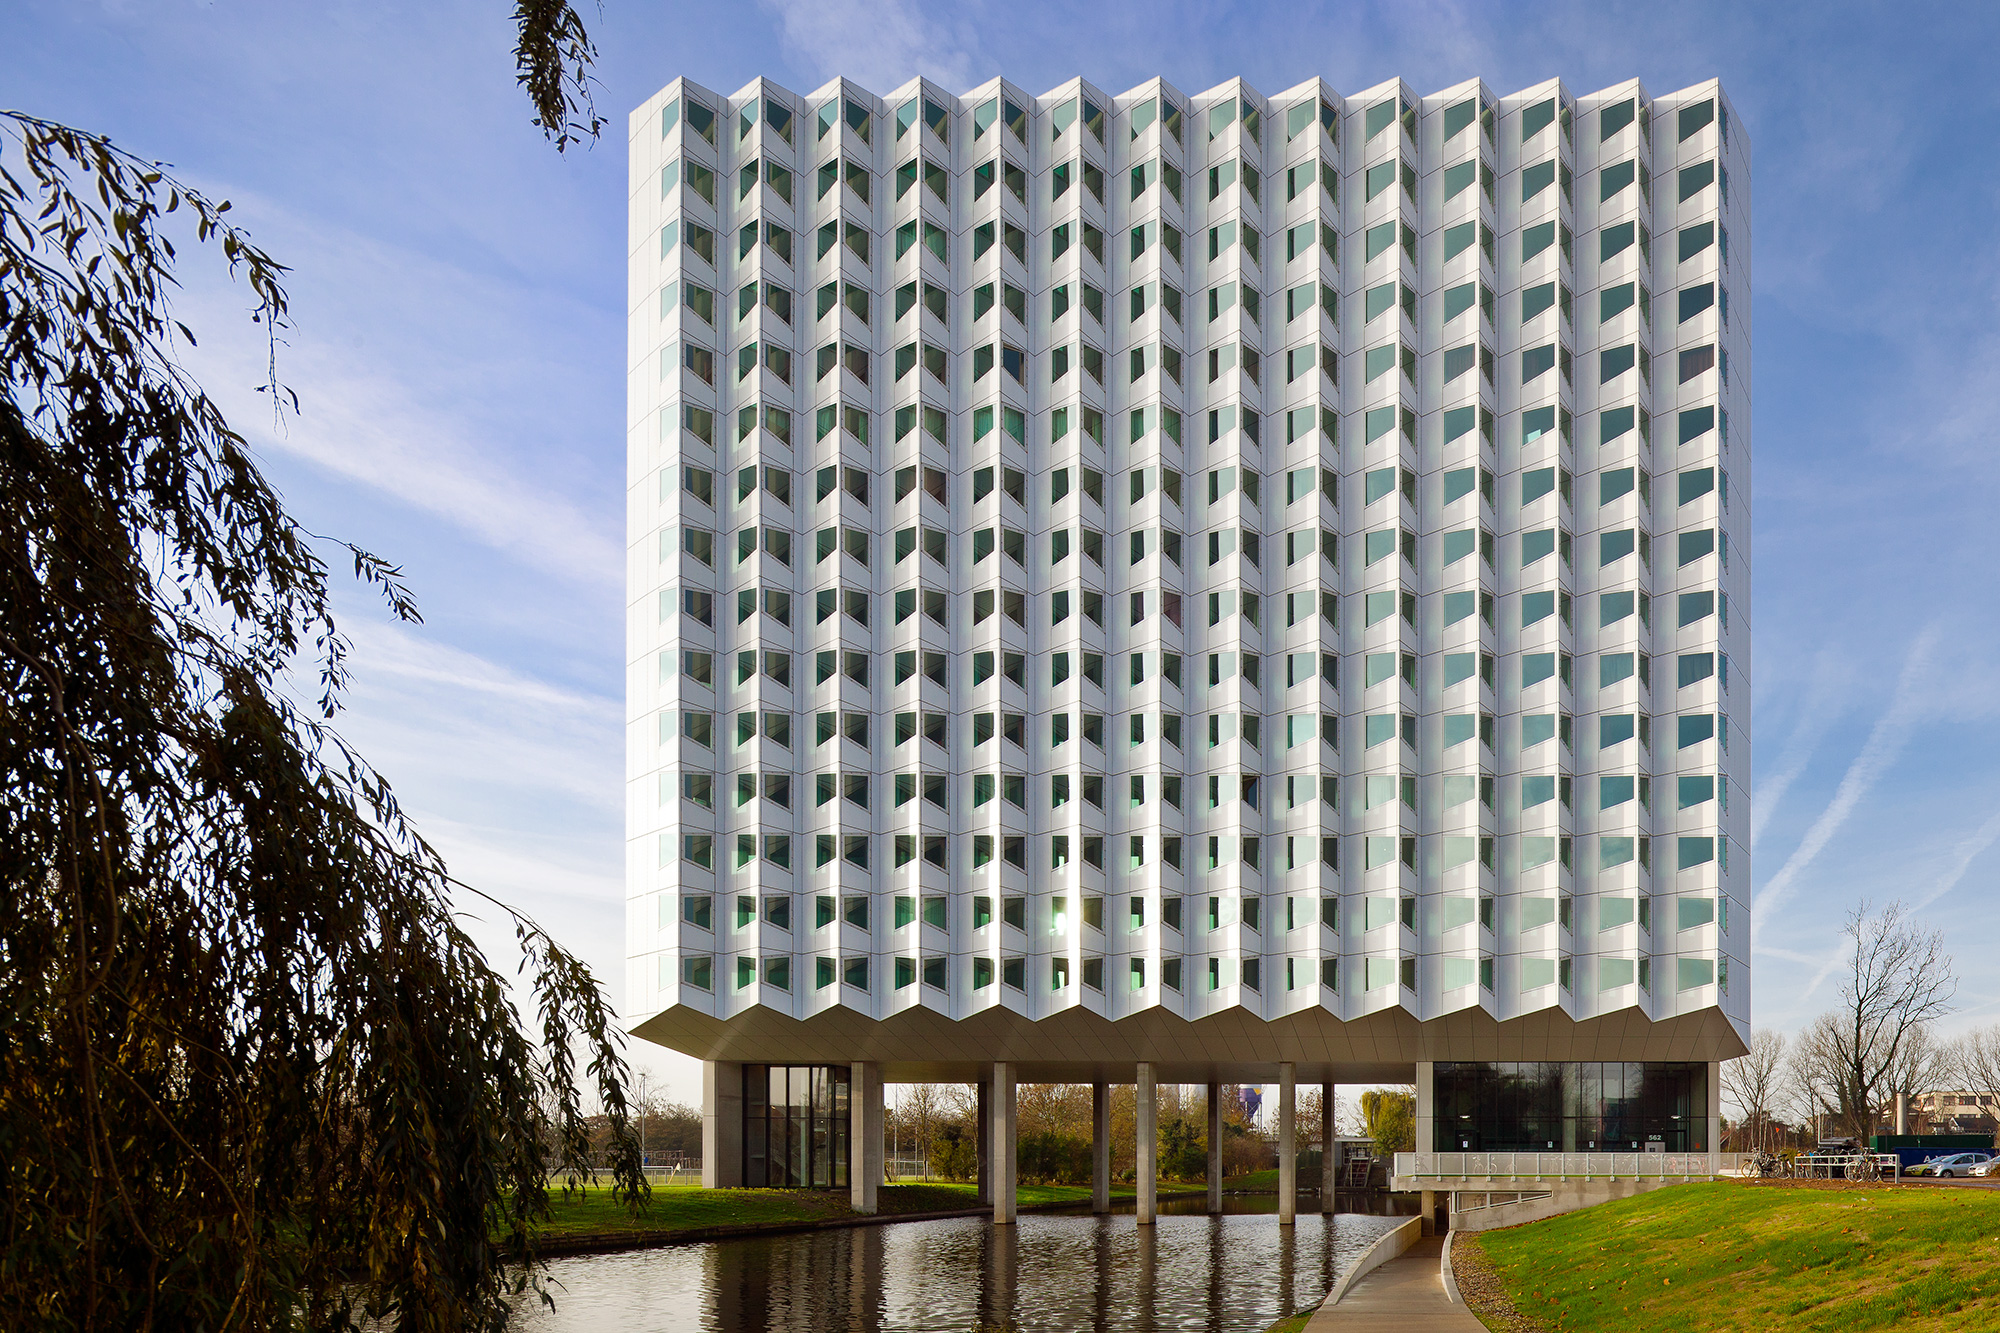 Studentenhuisvesting Delft 1